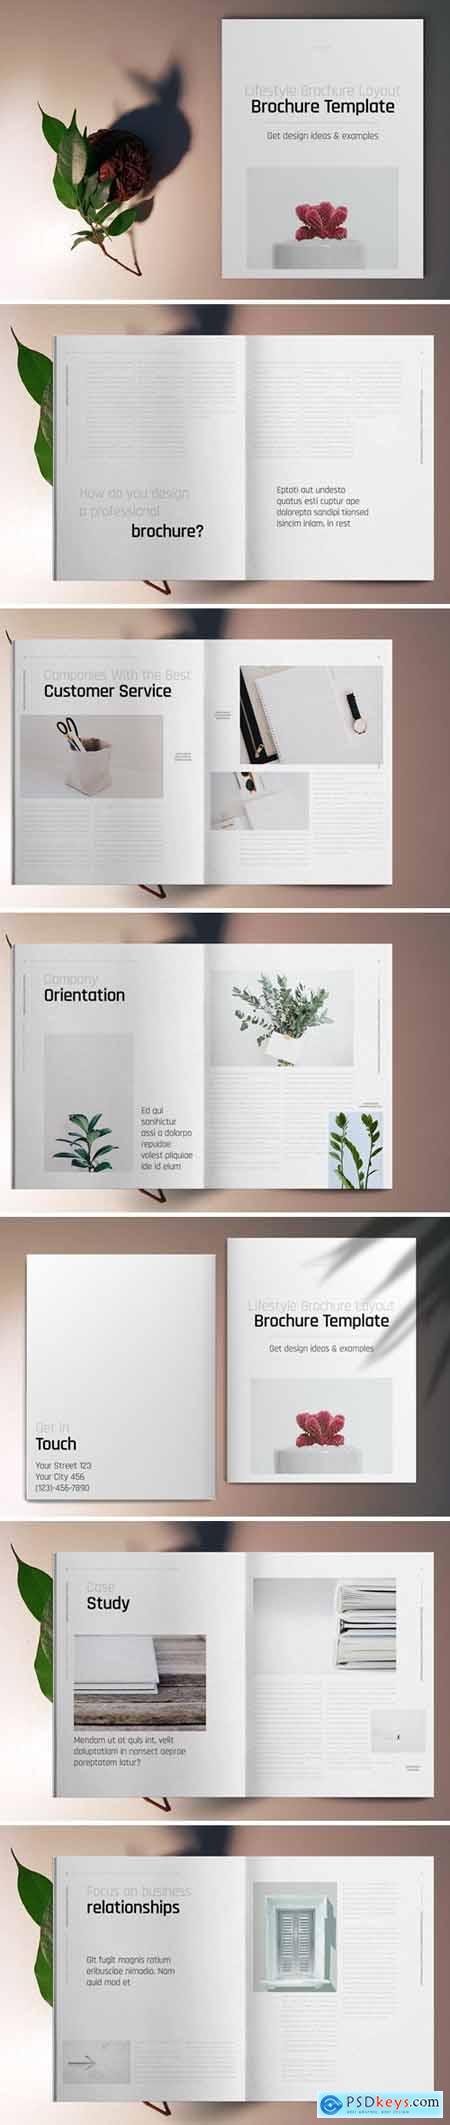 Lifestyle Brochure Template 5667396